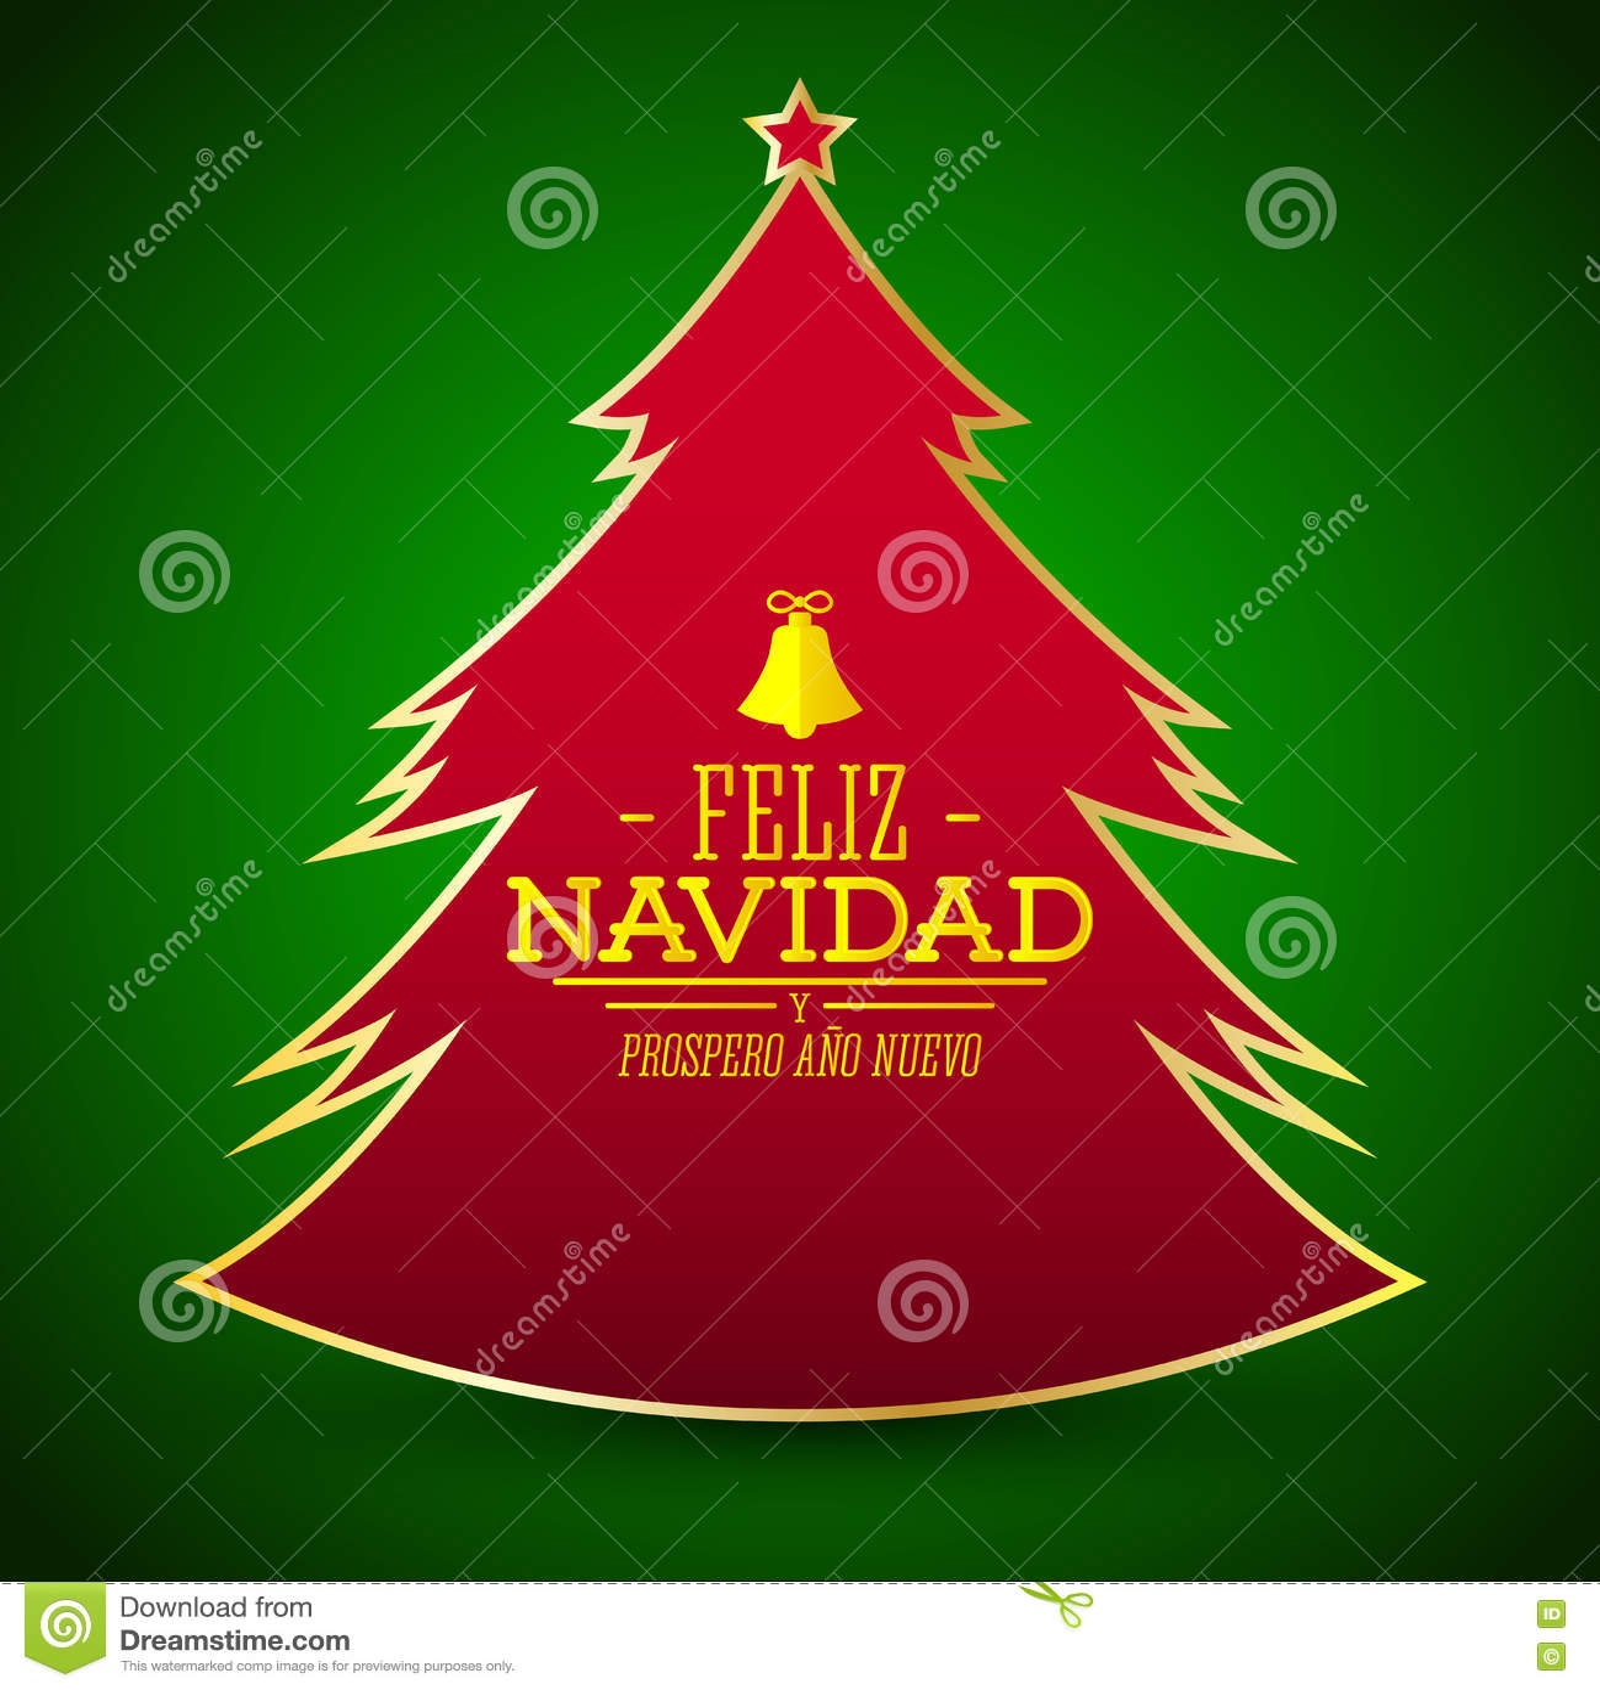 download feliz navidad y prospero ano nuevo spanish translation merry christmas and happy new